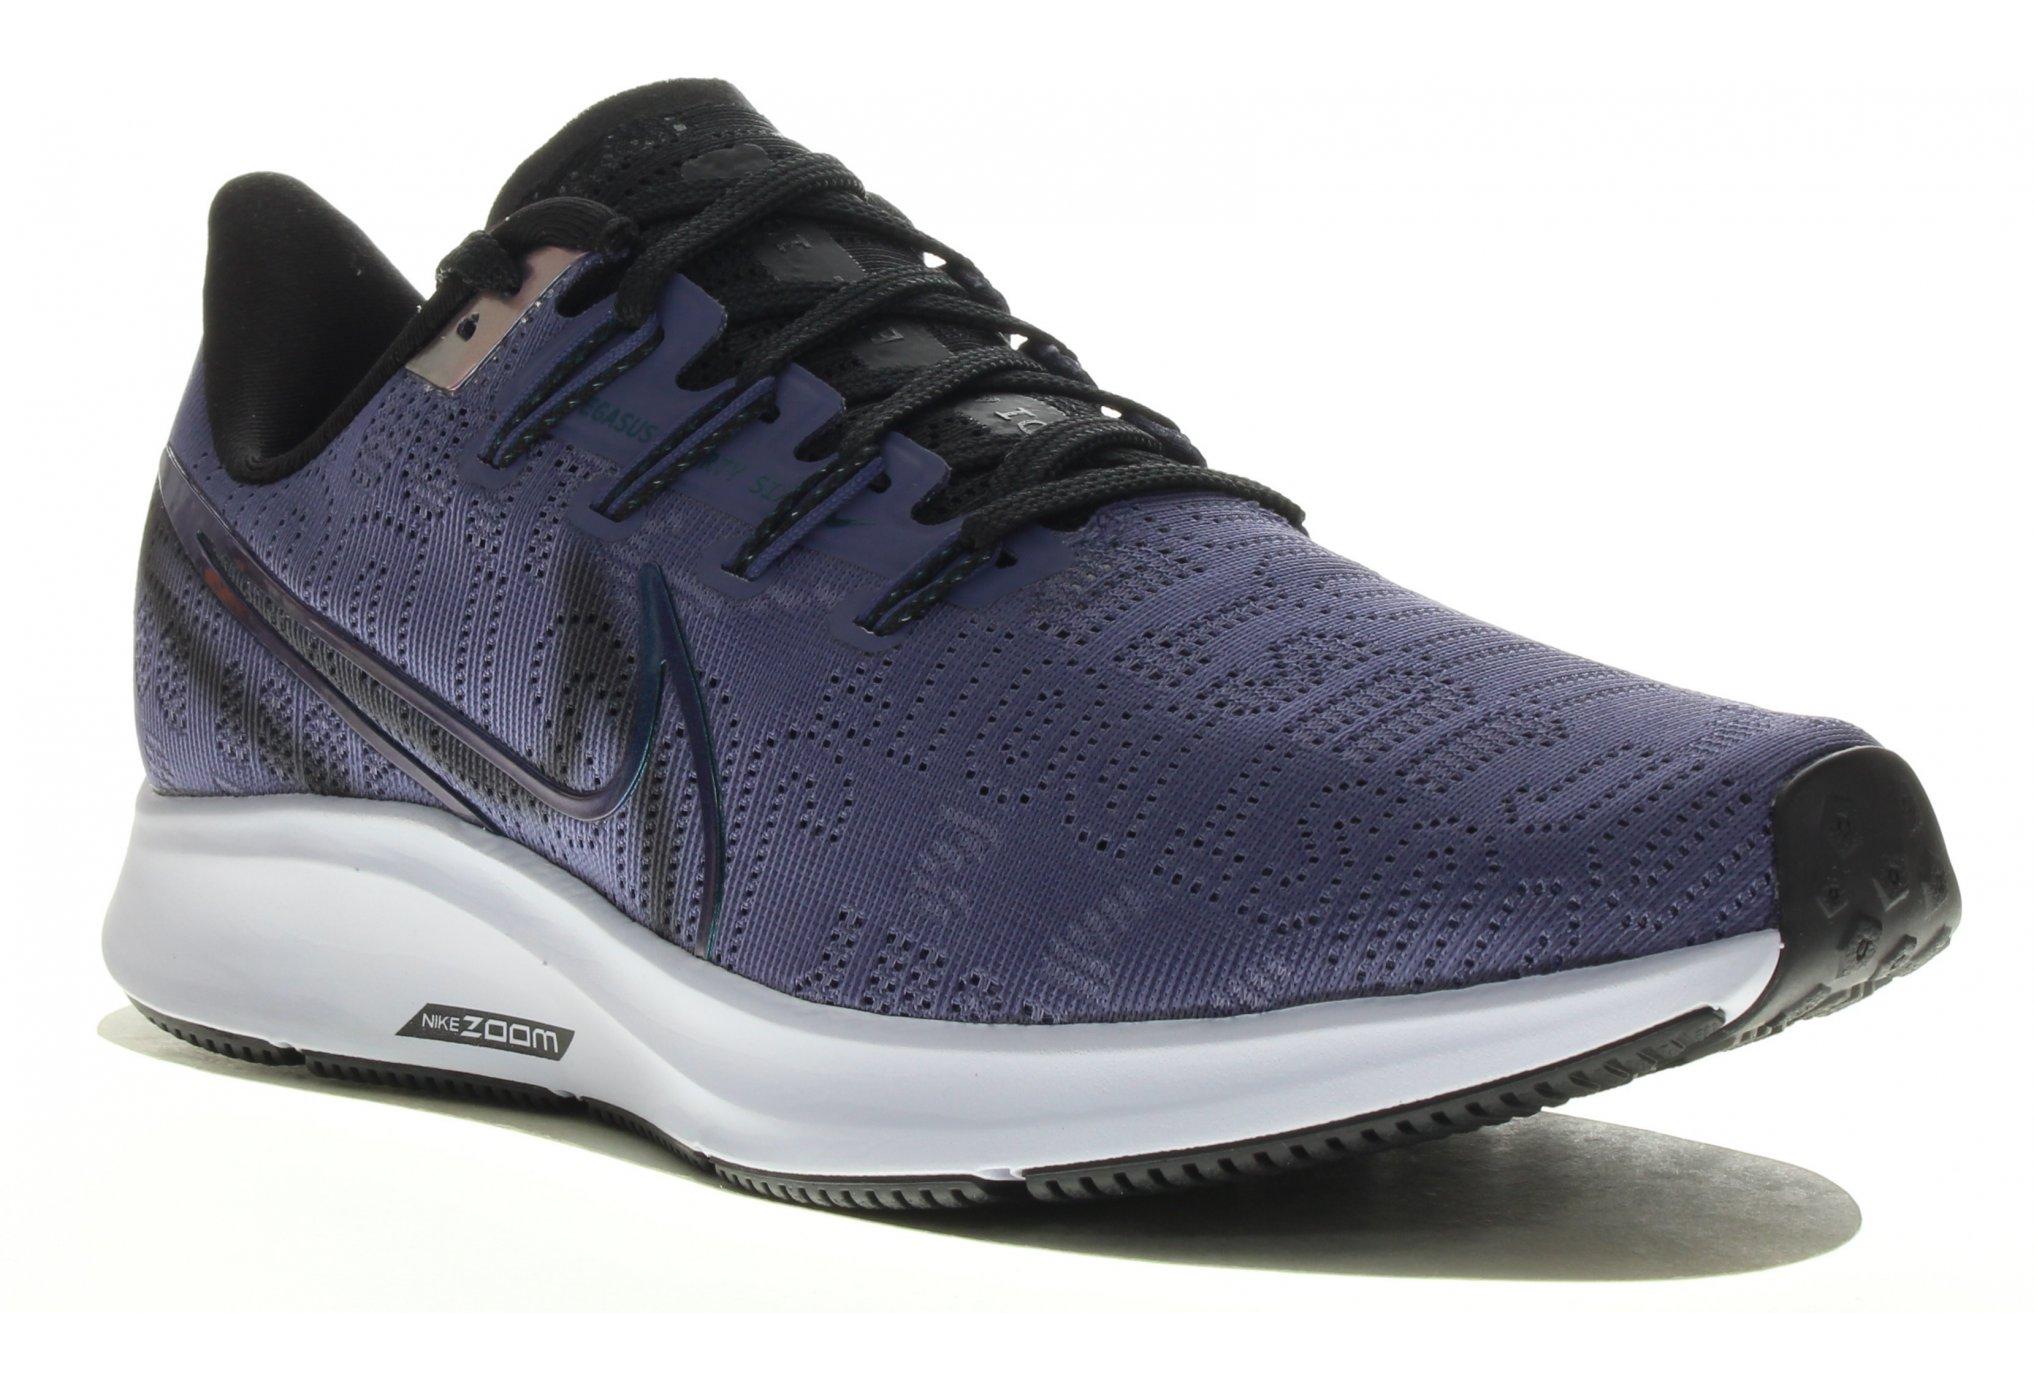 Nike Air Zoom Pegasus 36 Premium Rise Chaussures running femme